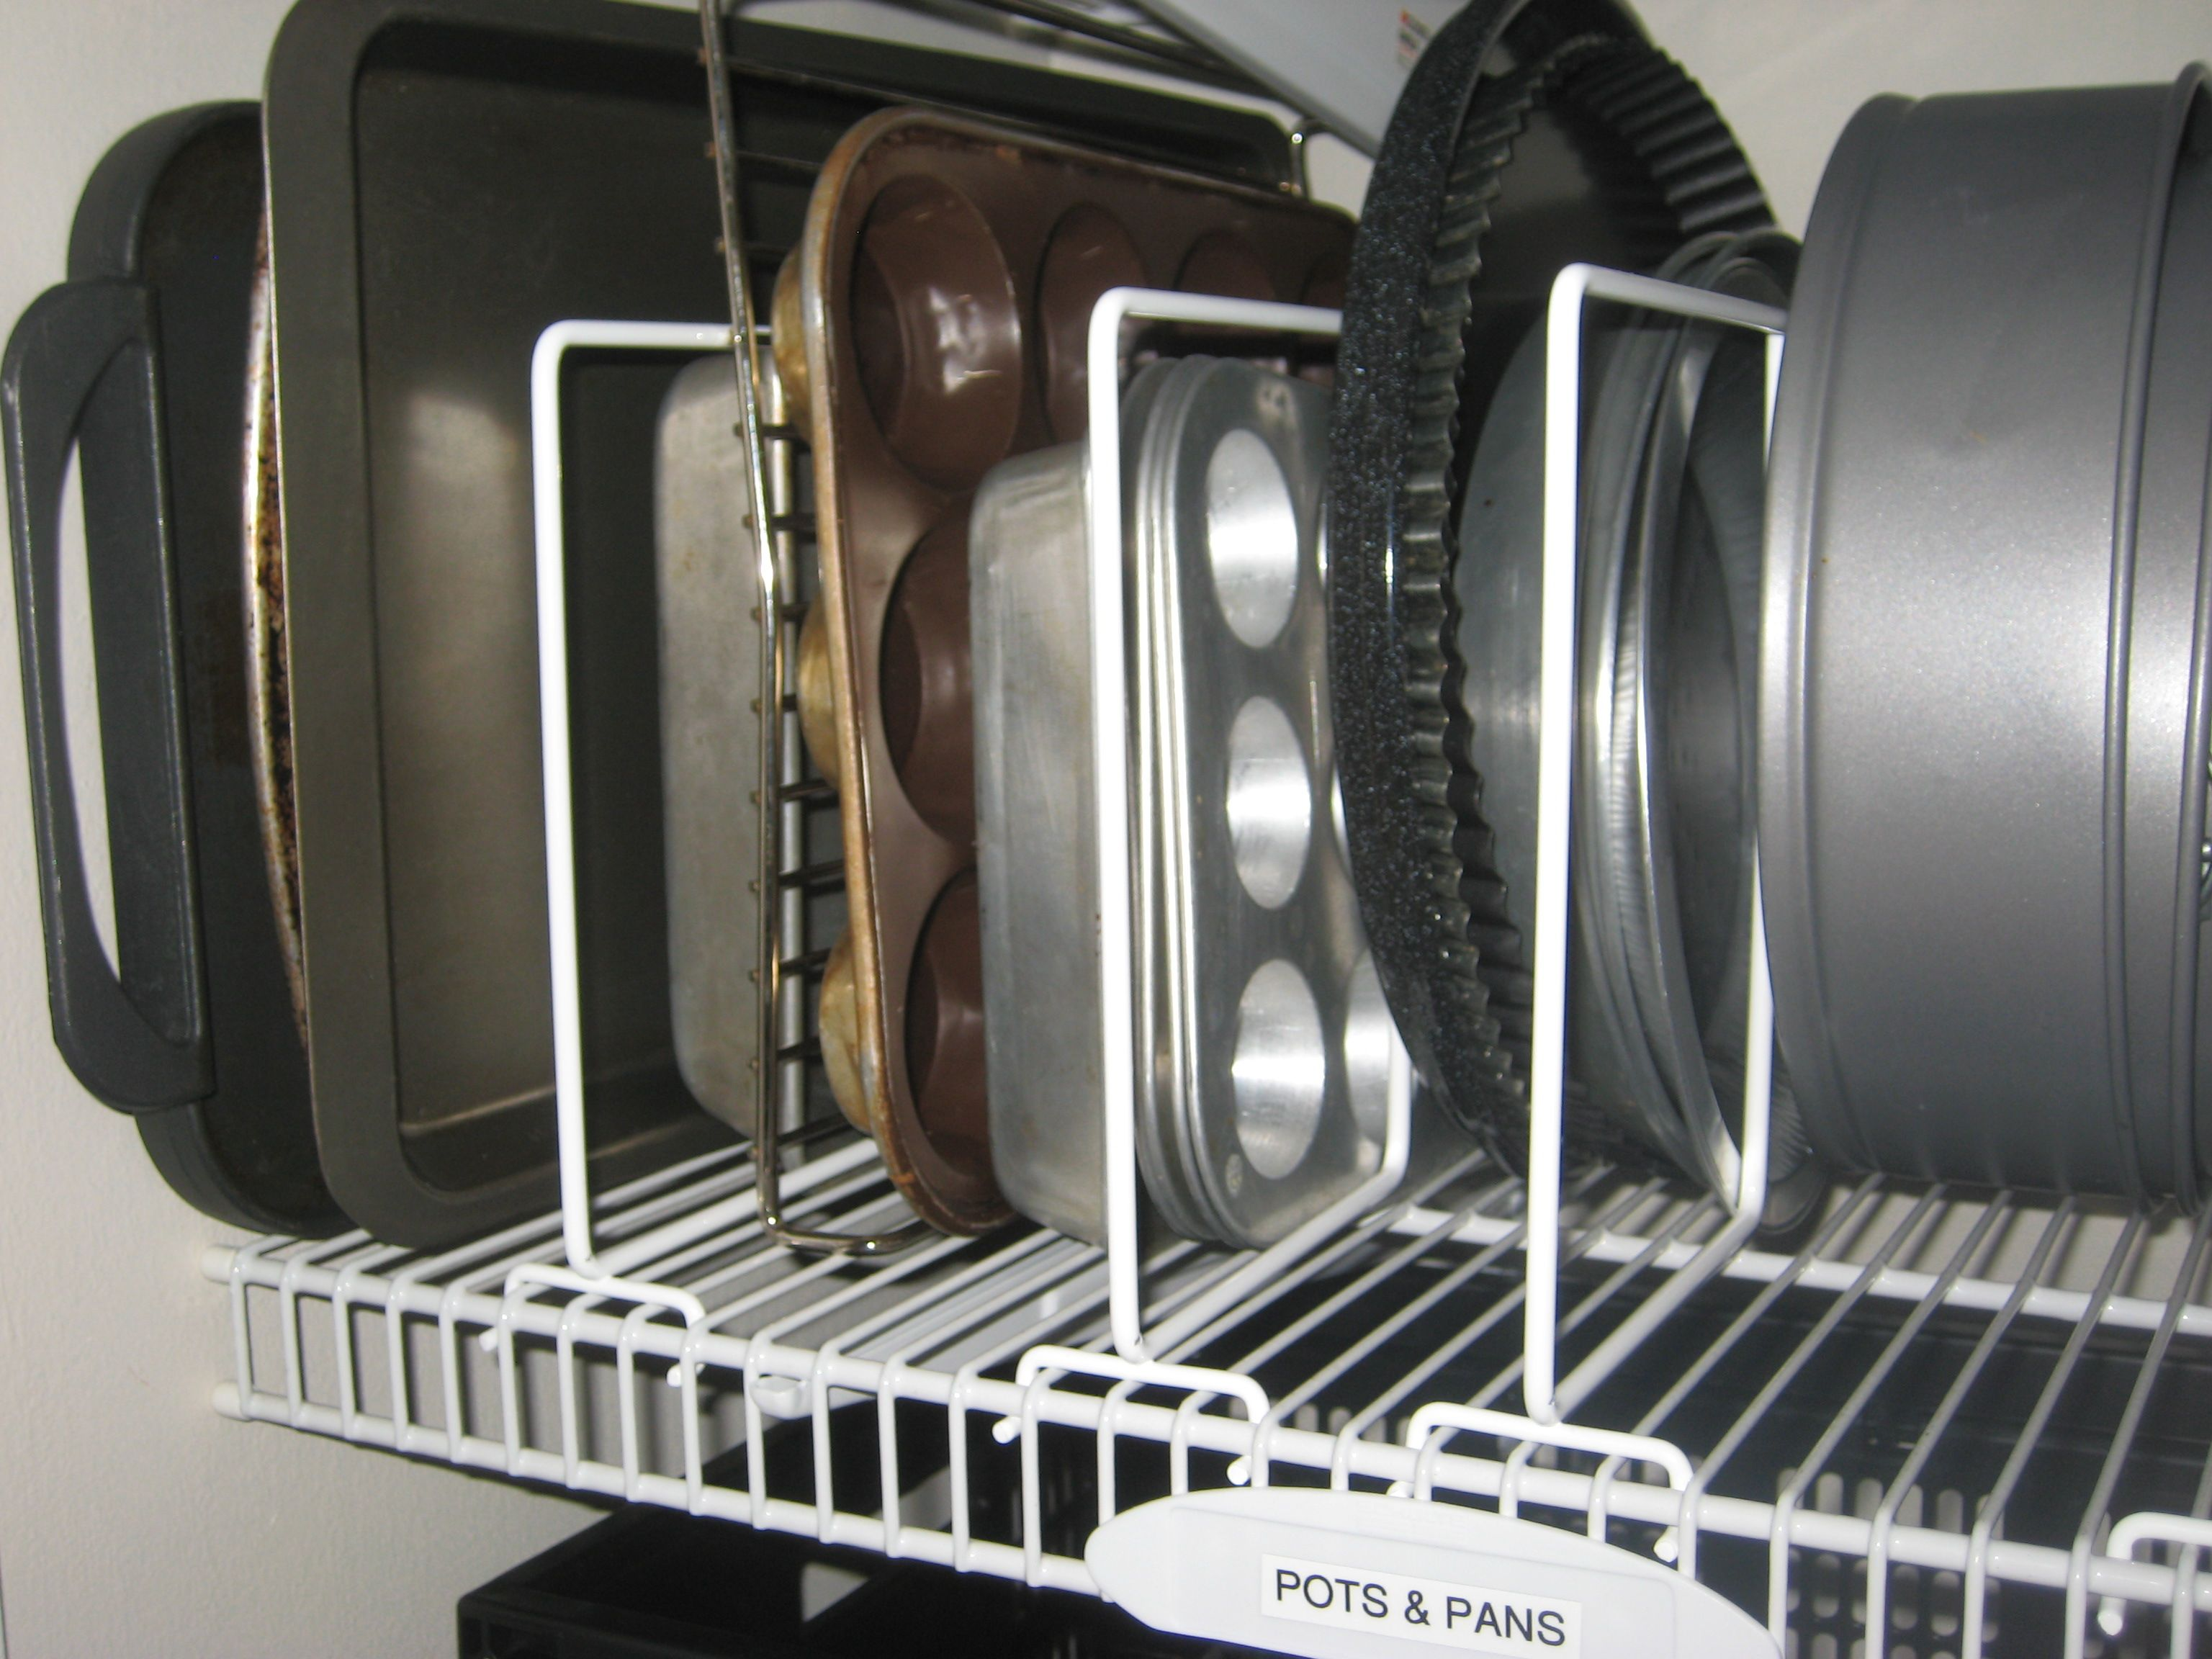 Pots And Pans Storage Ideas To Take Note Of: Kitchen Organization & Pantry Organization: Vertical Pan